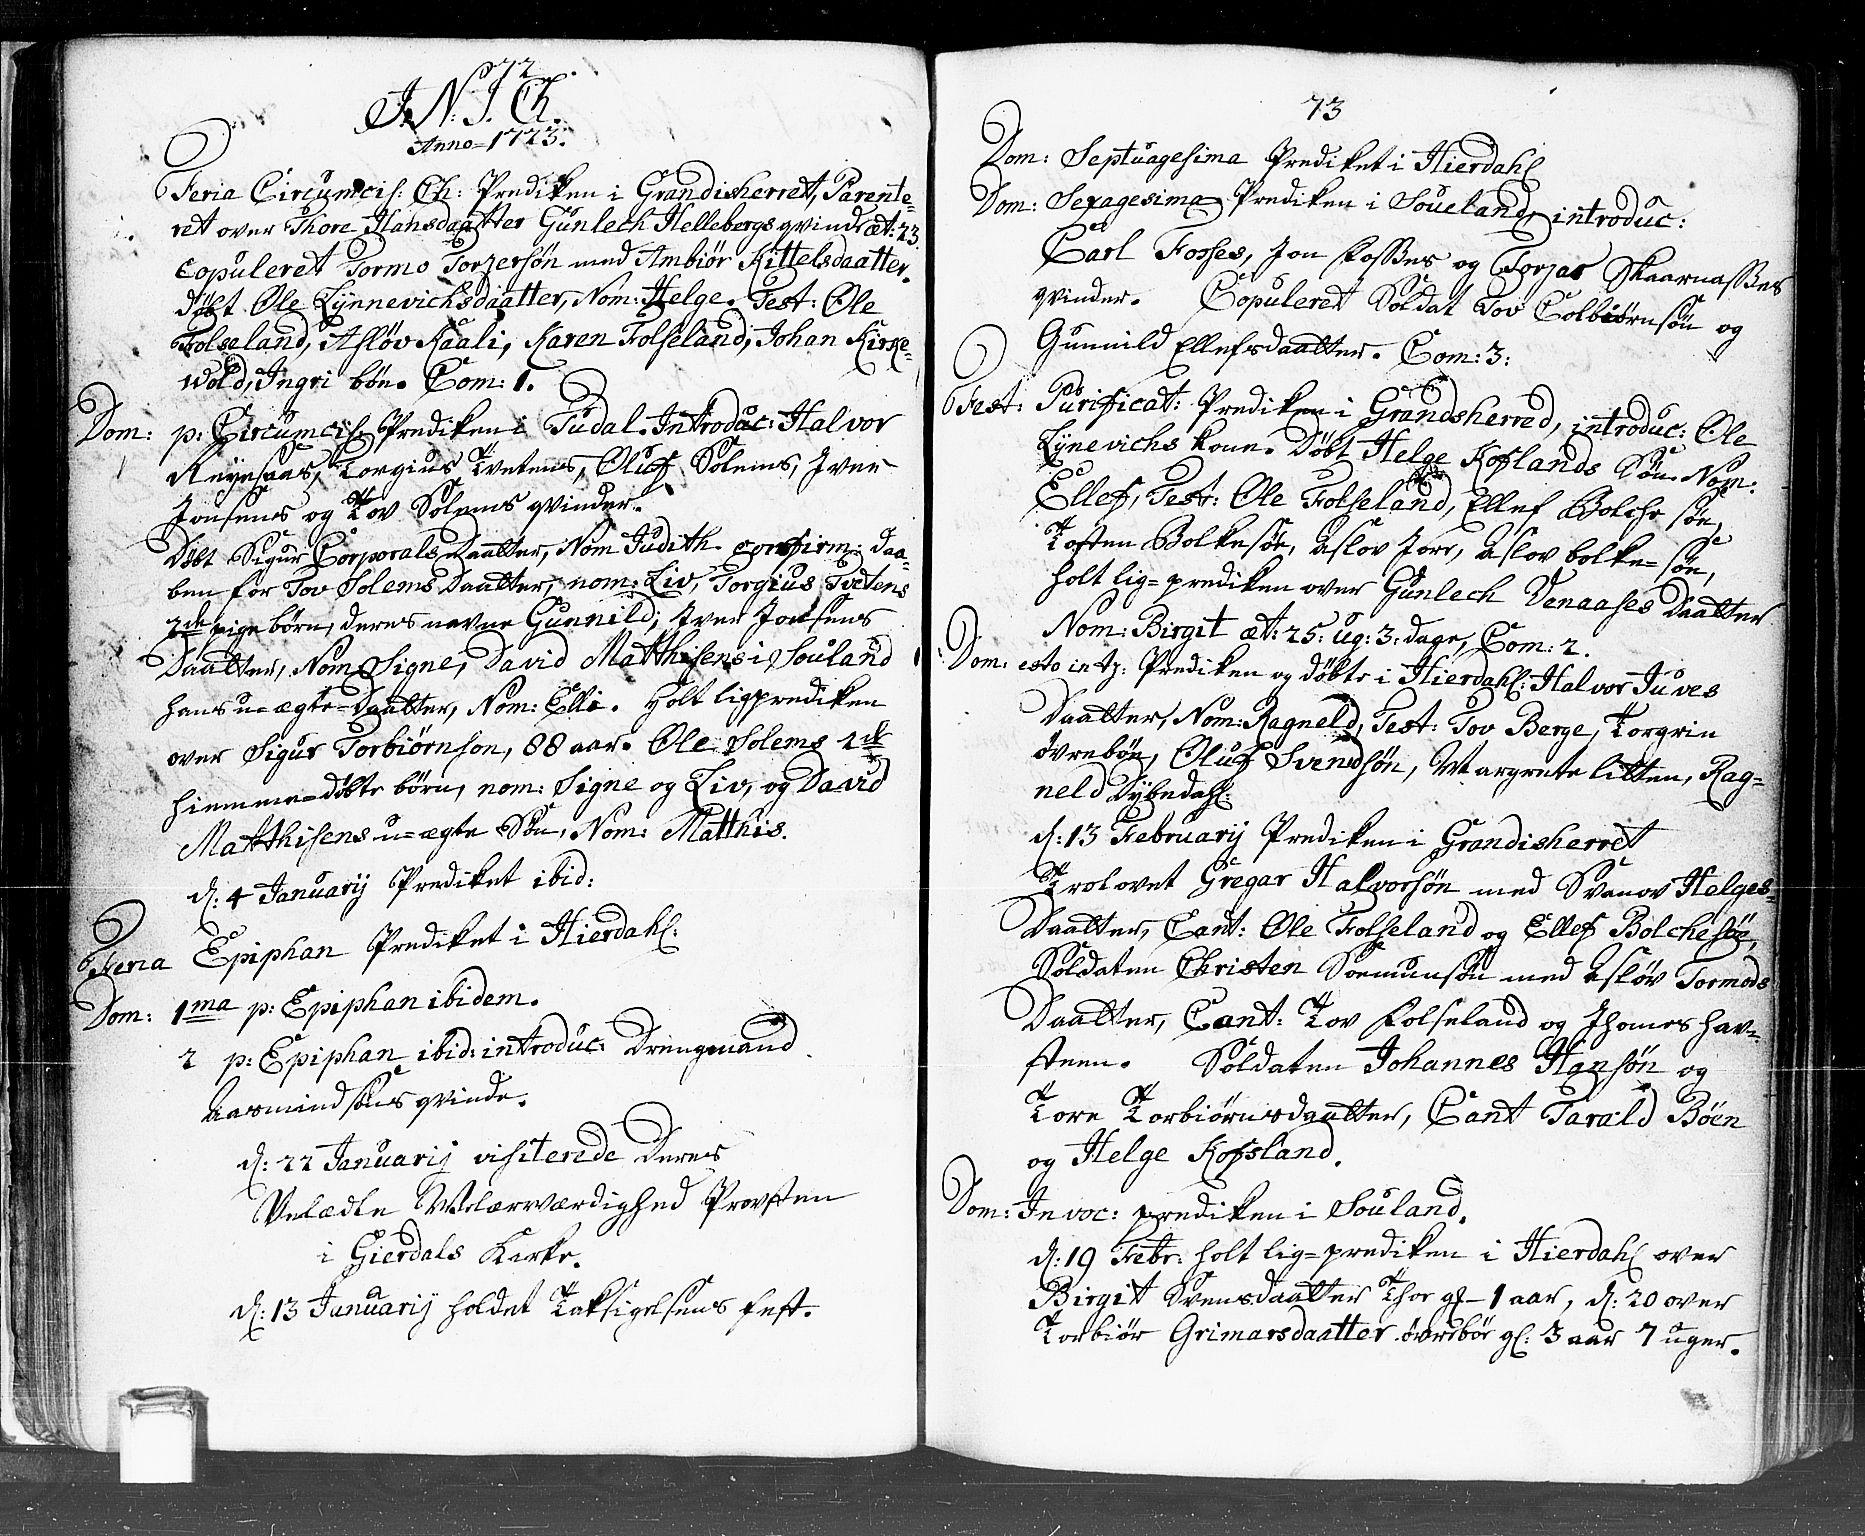 SAKO, Hjartdal kirkebøker, F/Fa/L0002: Ministerialbok nr. I 2, 1716-1754, s. 72-73